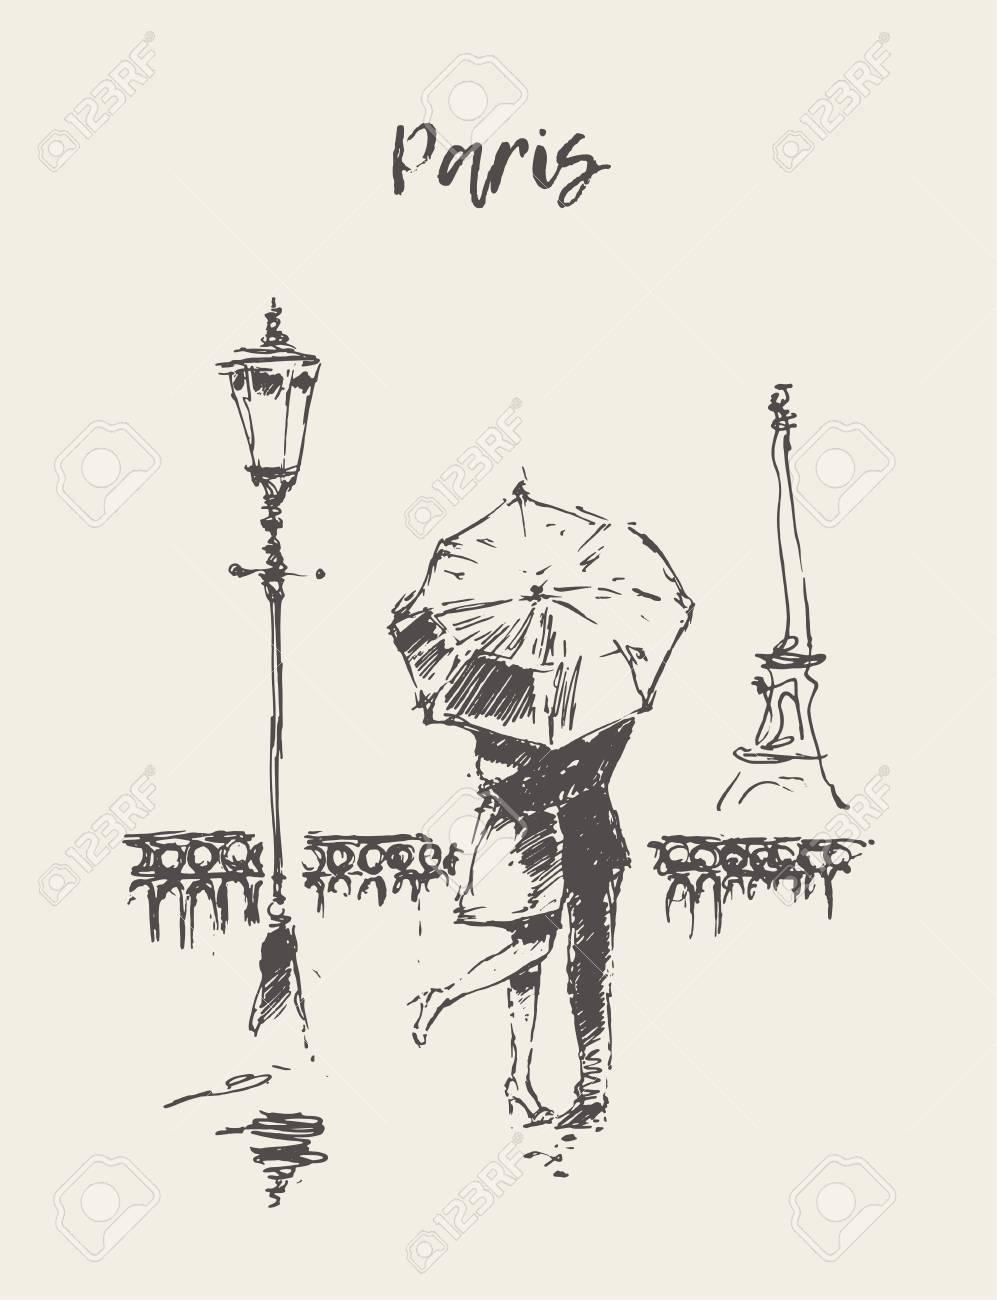 A loving couple under umbrella in the rain in paris hand drawn vector illustration